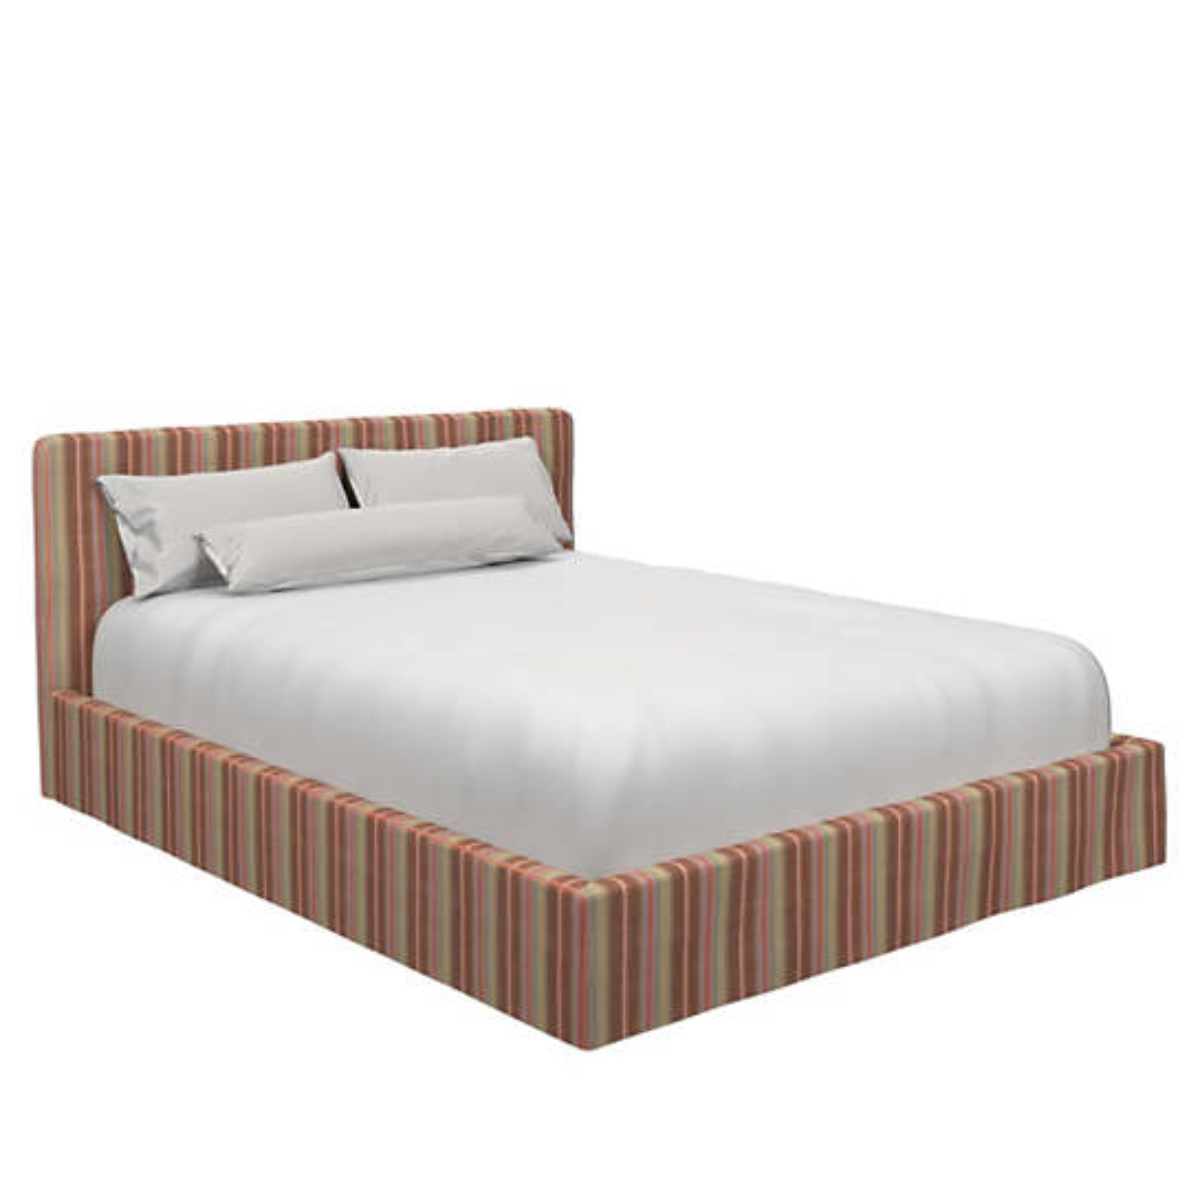 Highclere Stripe Loft Bed